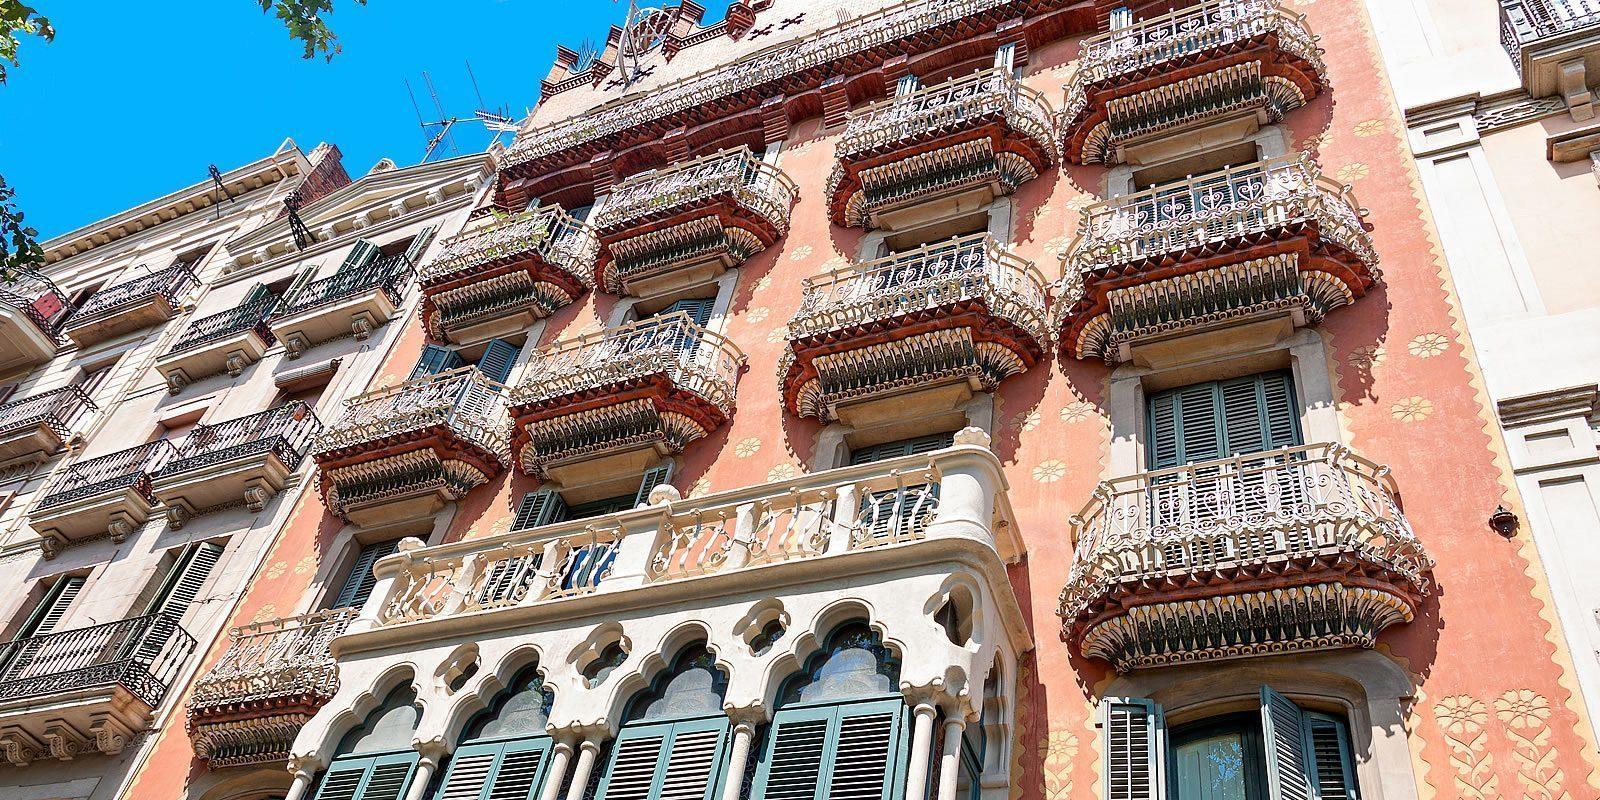 acheter un appartement à barcelone